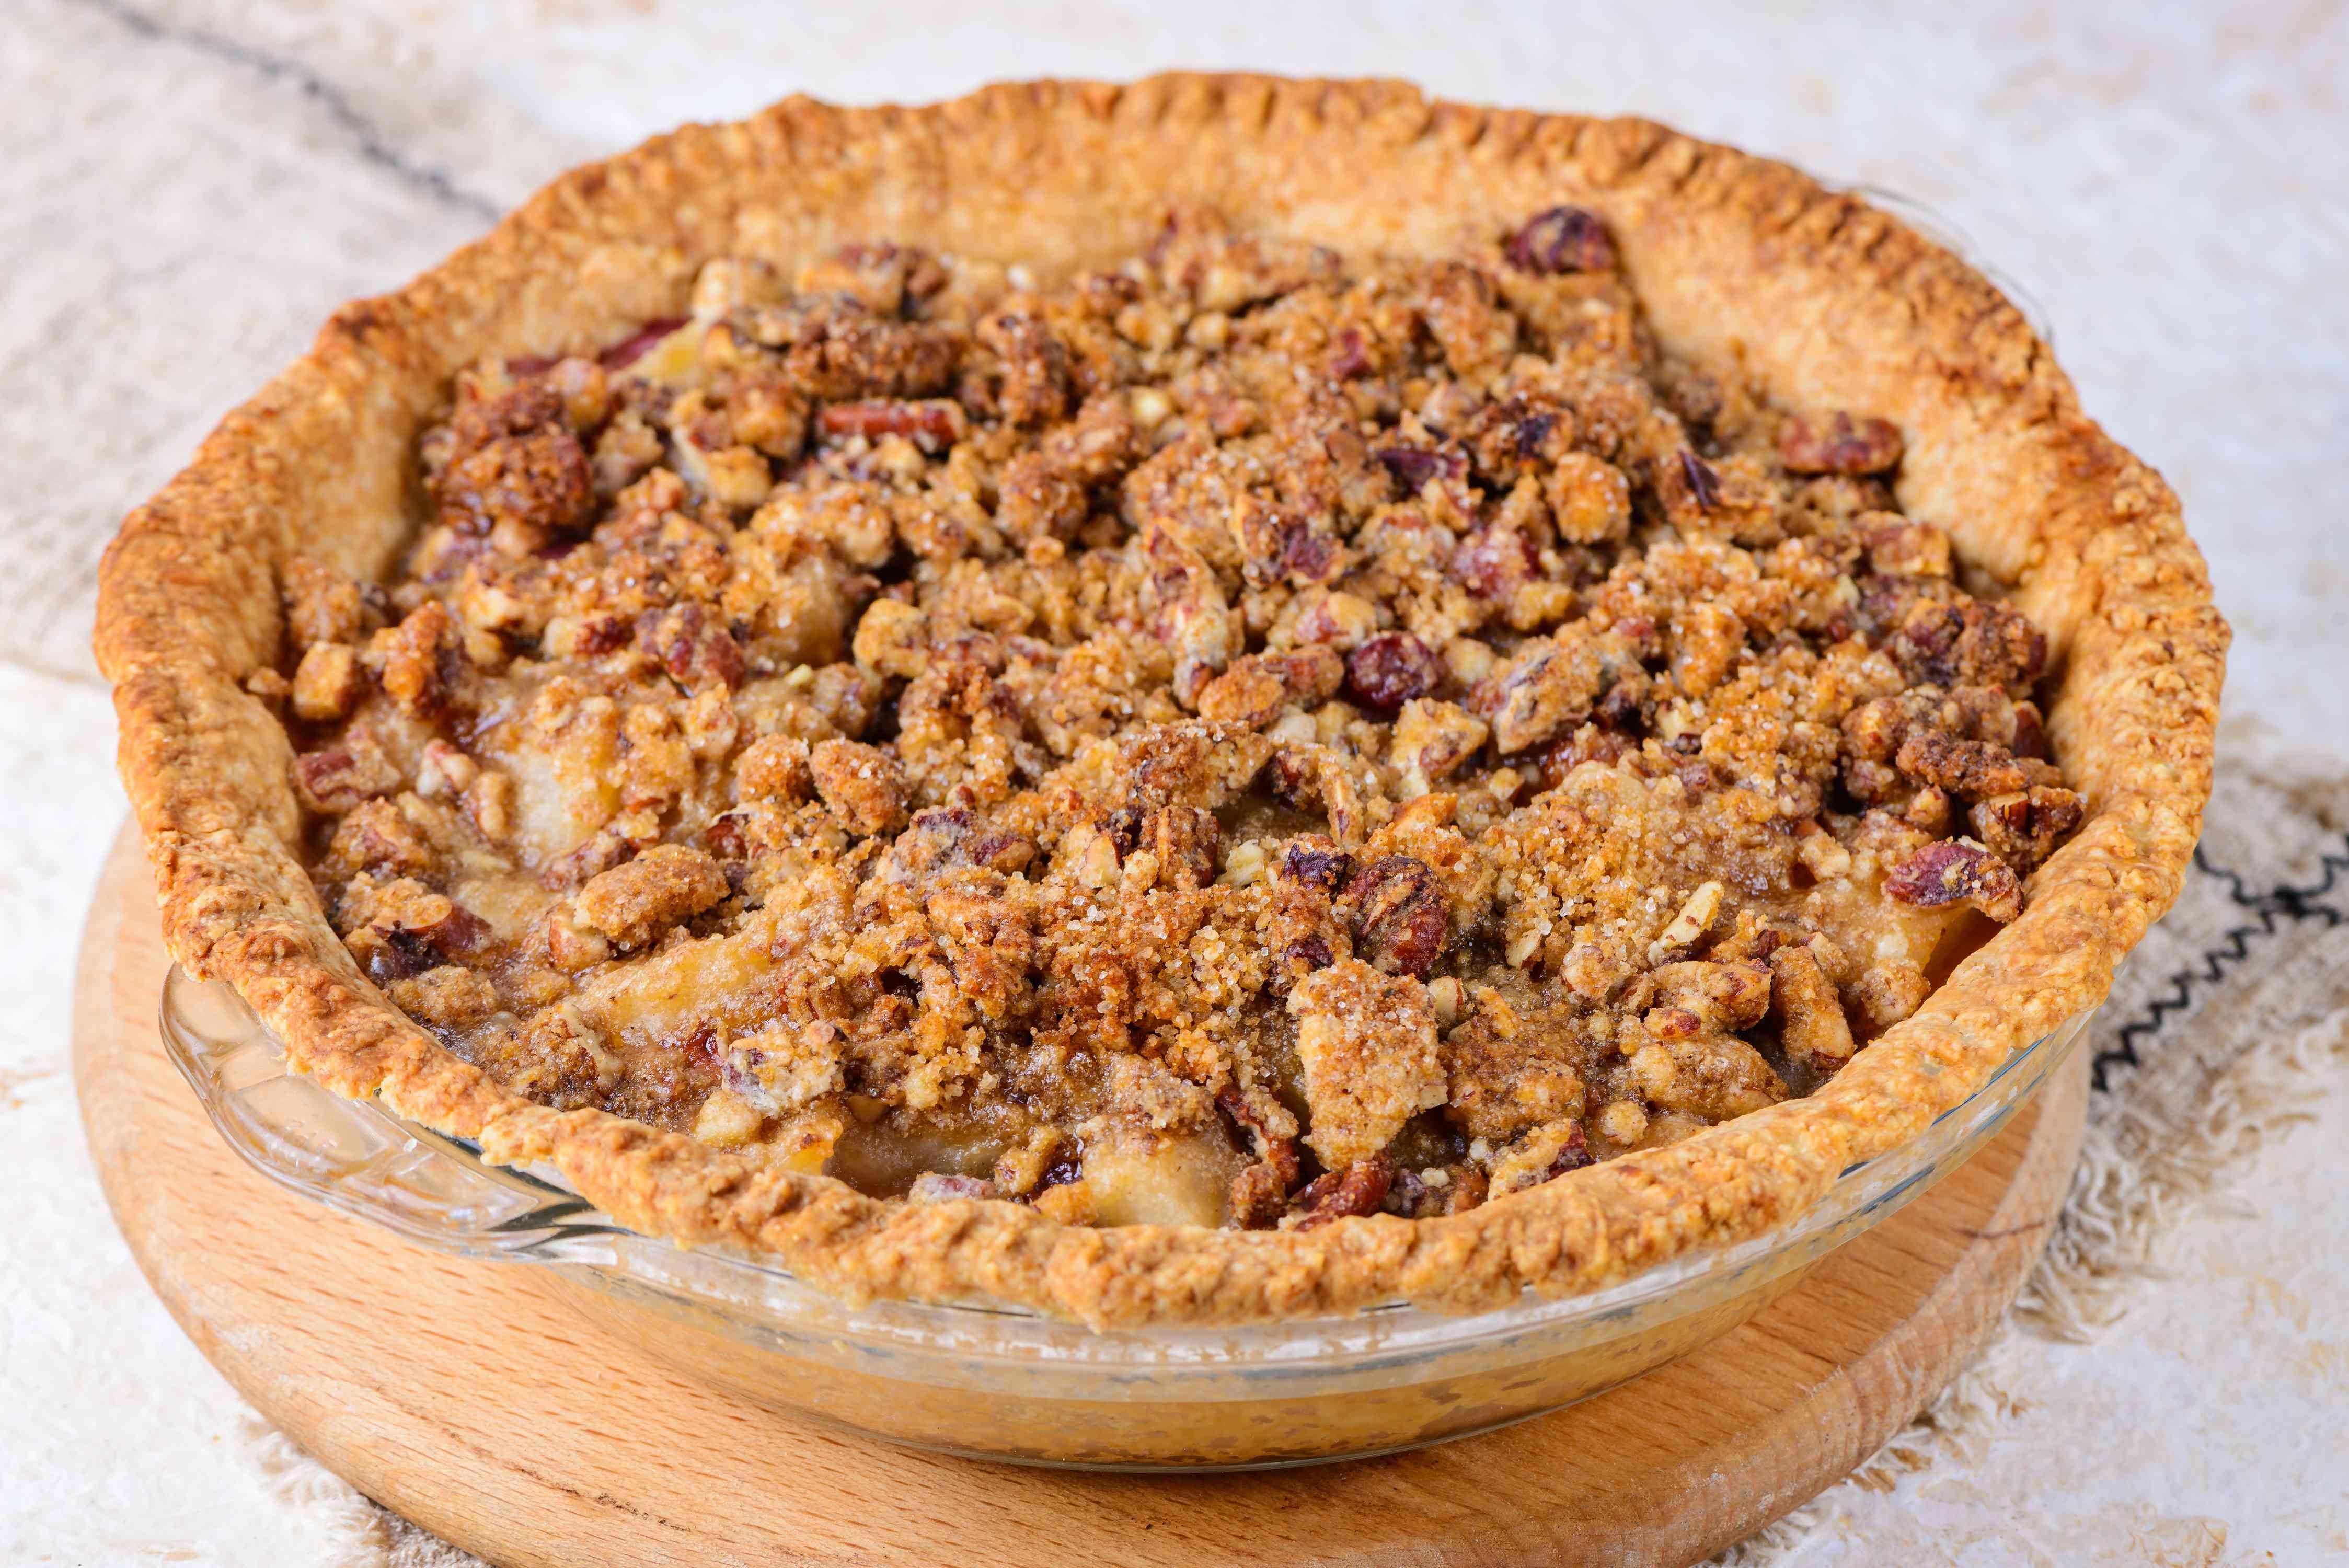 Place pie on baking sheet